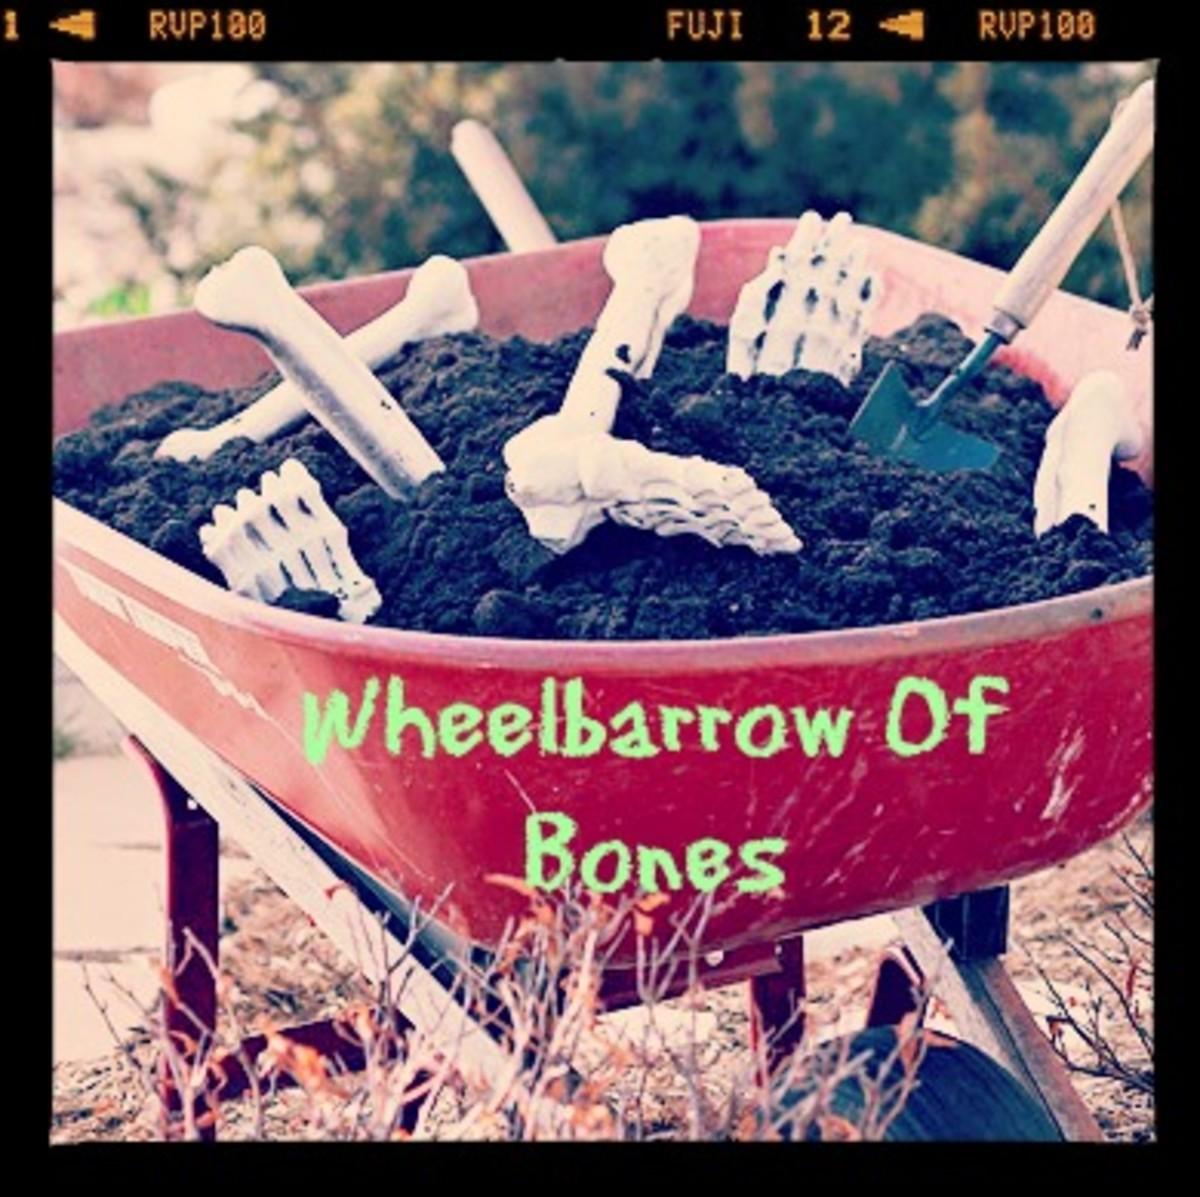 Wheelbarrow of Bones